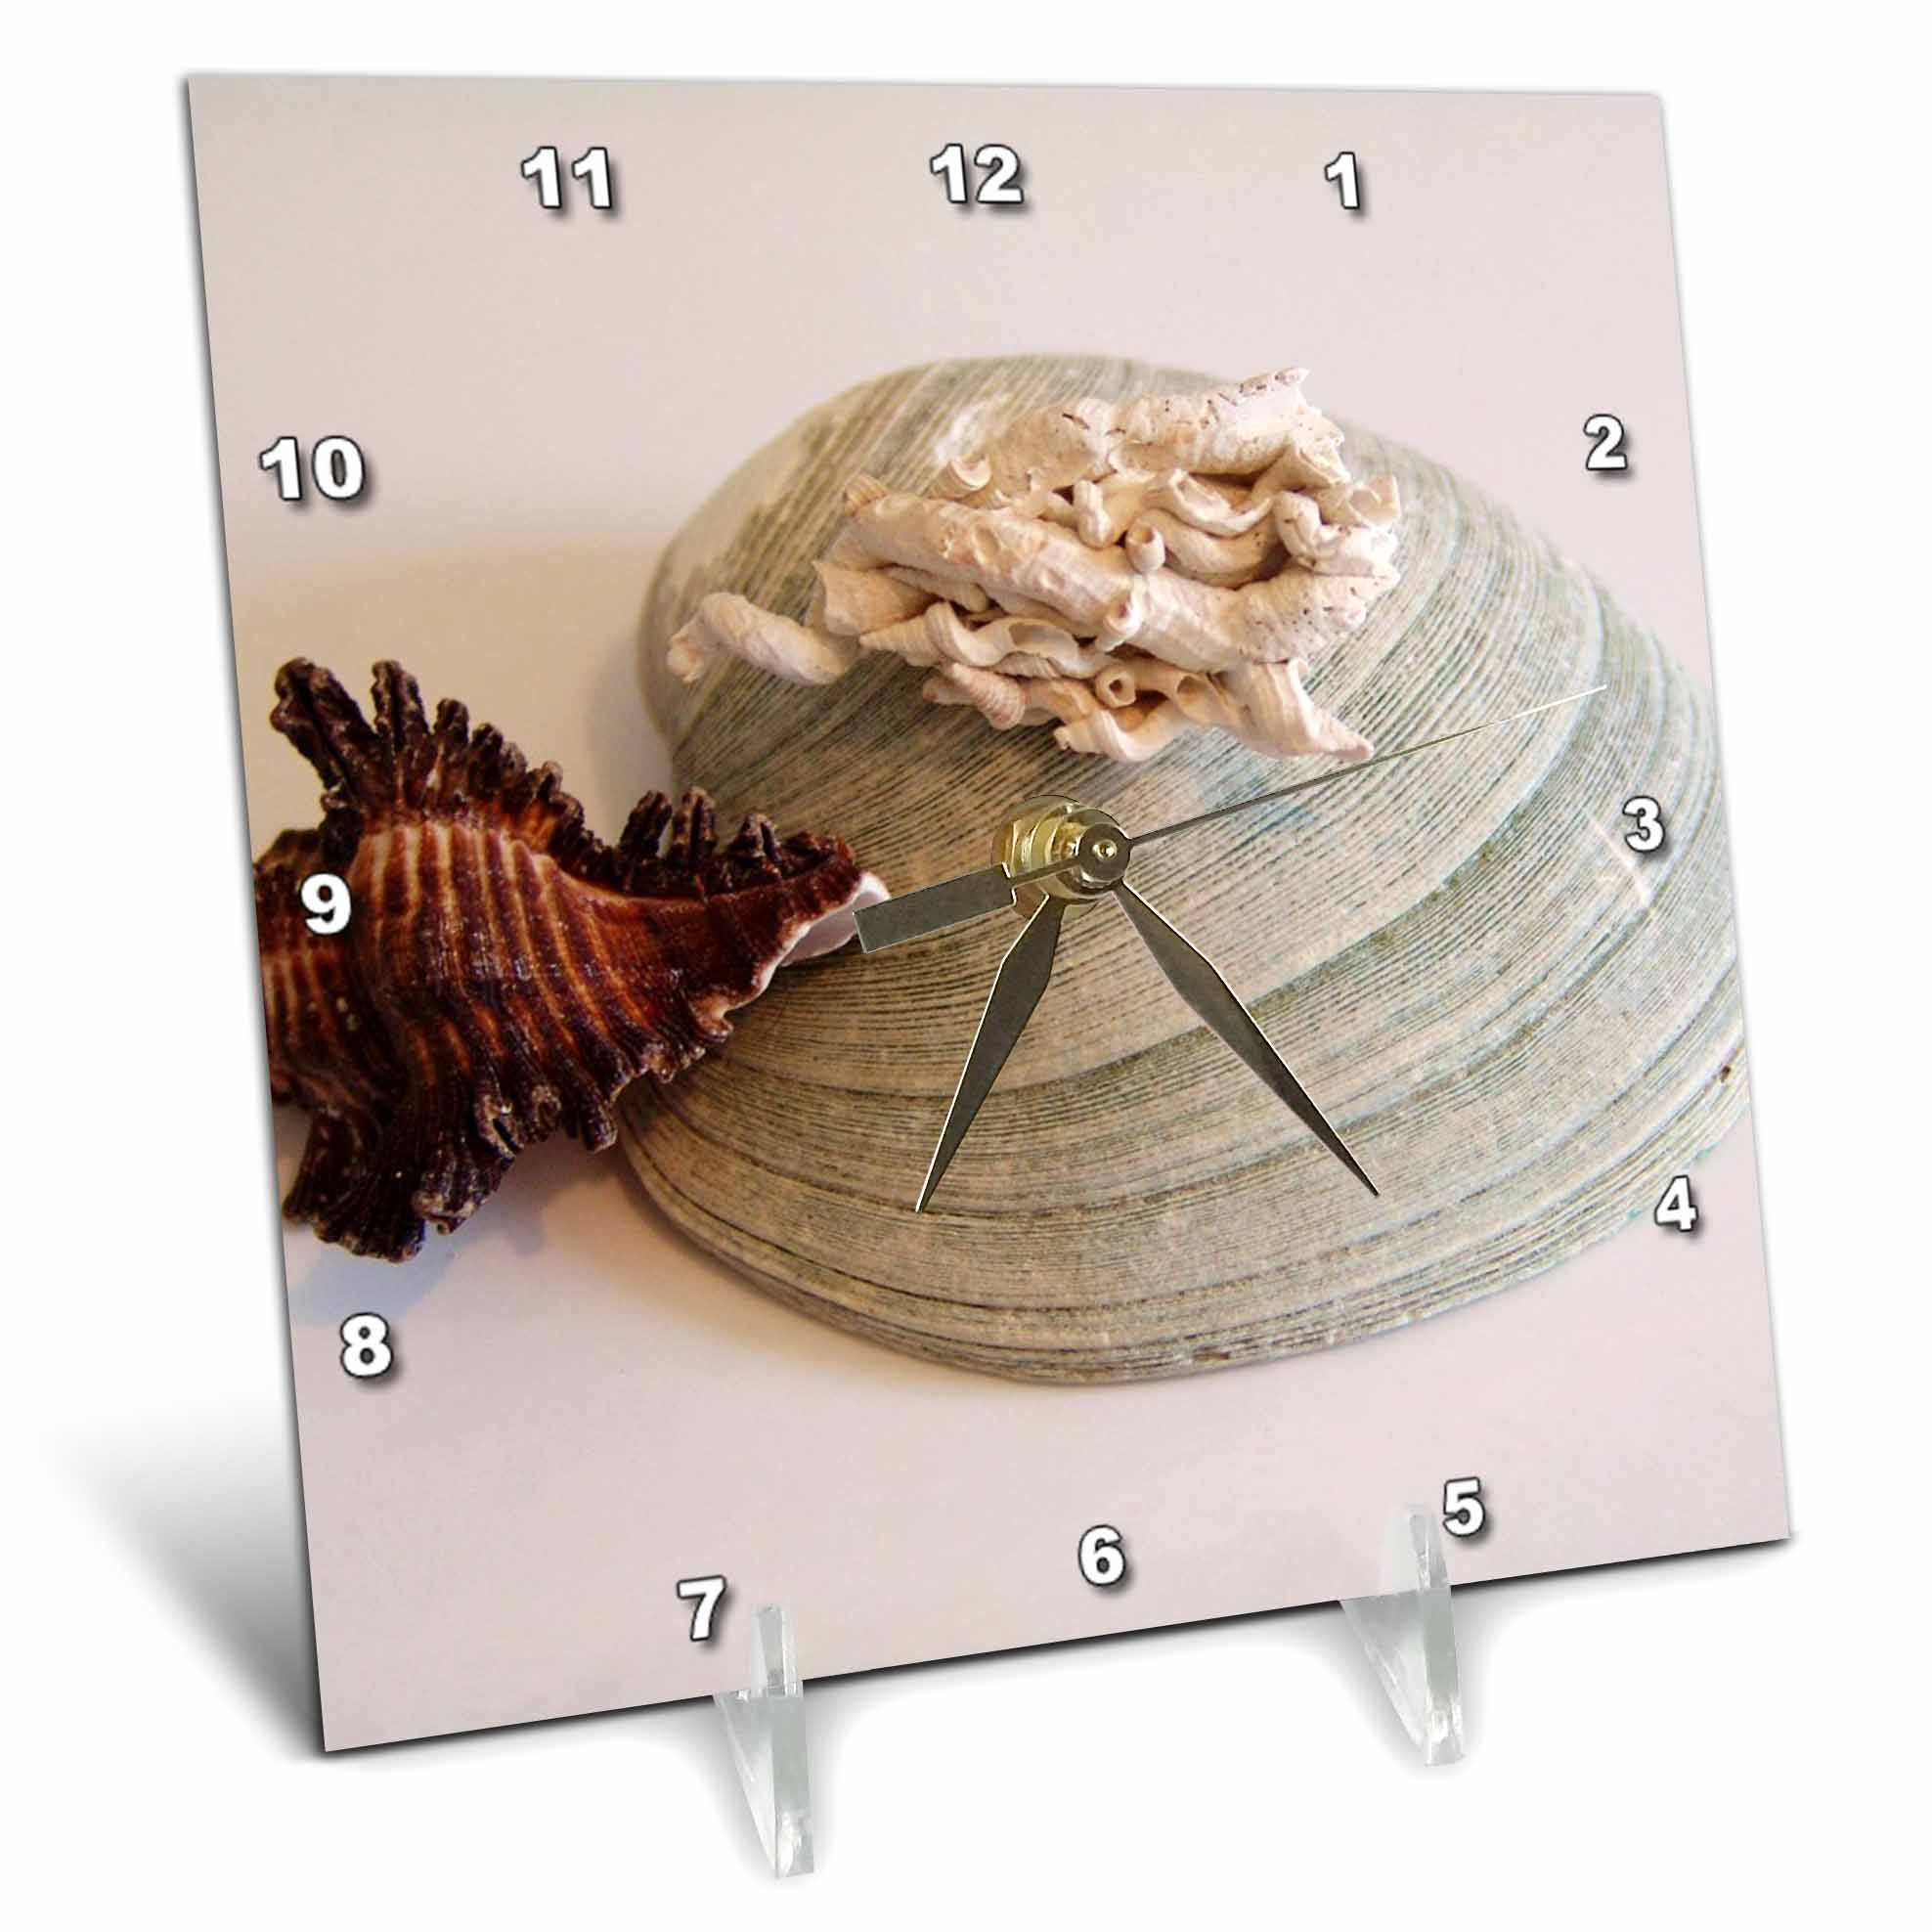 3dRose Seashells On White, Desk Clock, 6 by 6-inch by 3dRose